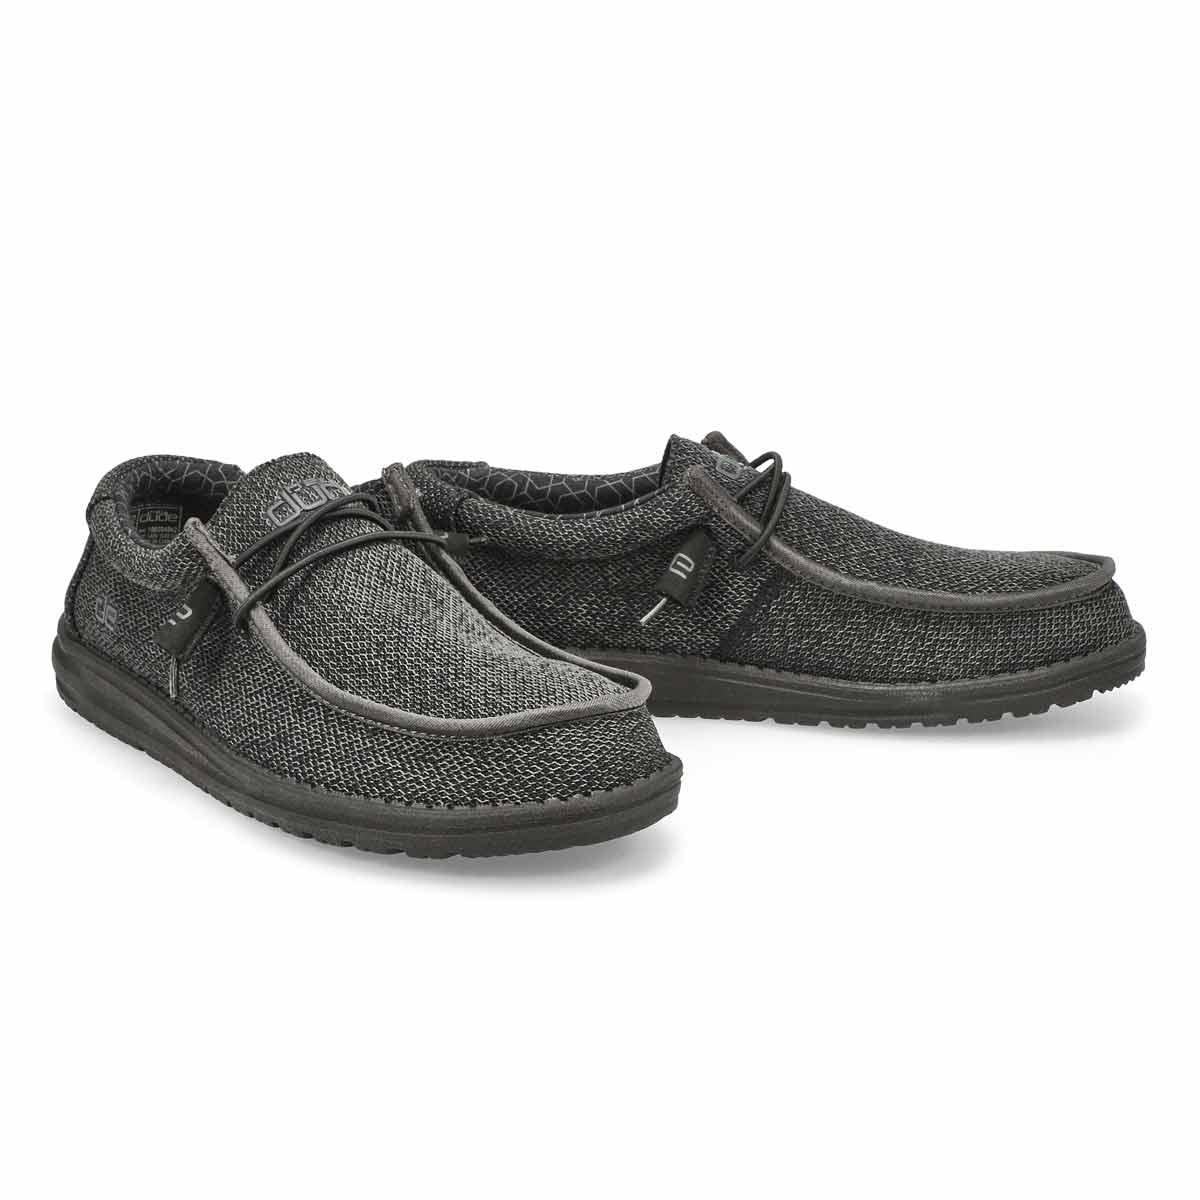 Mns Wally Sox Micro black casual shoe